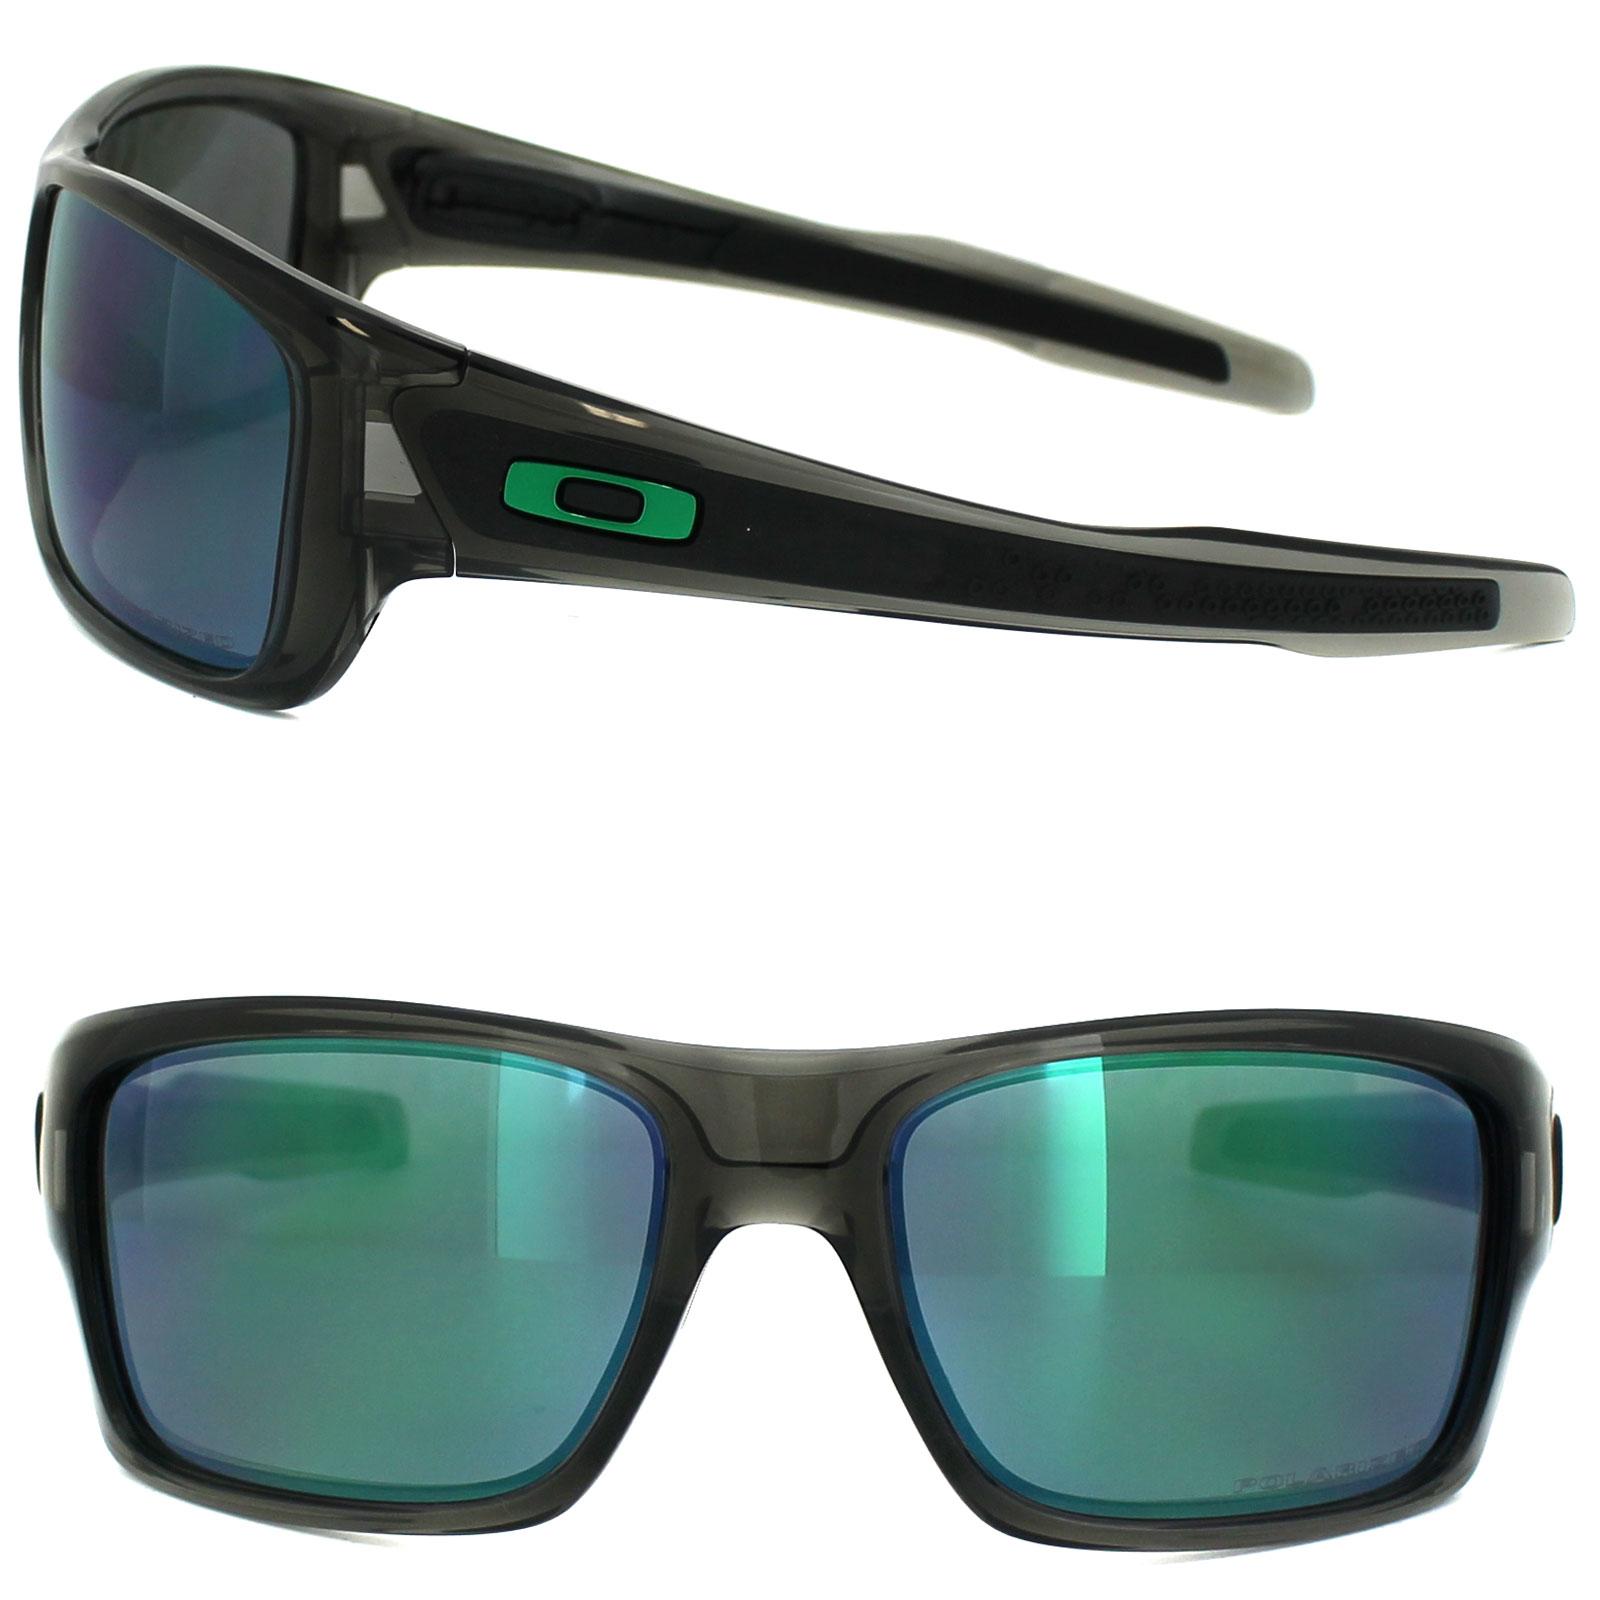 e3699770d94 Oakley Sunglasses Turbine OO9263-09 Grey Smoke Jade Iridium Polarized